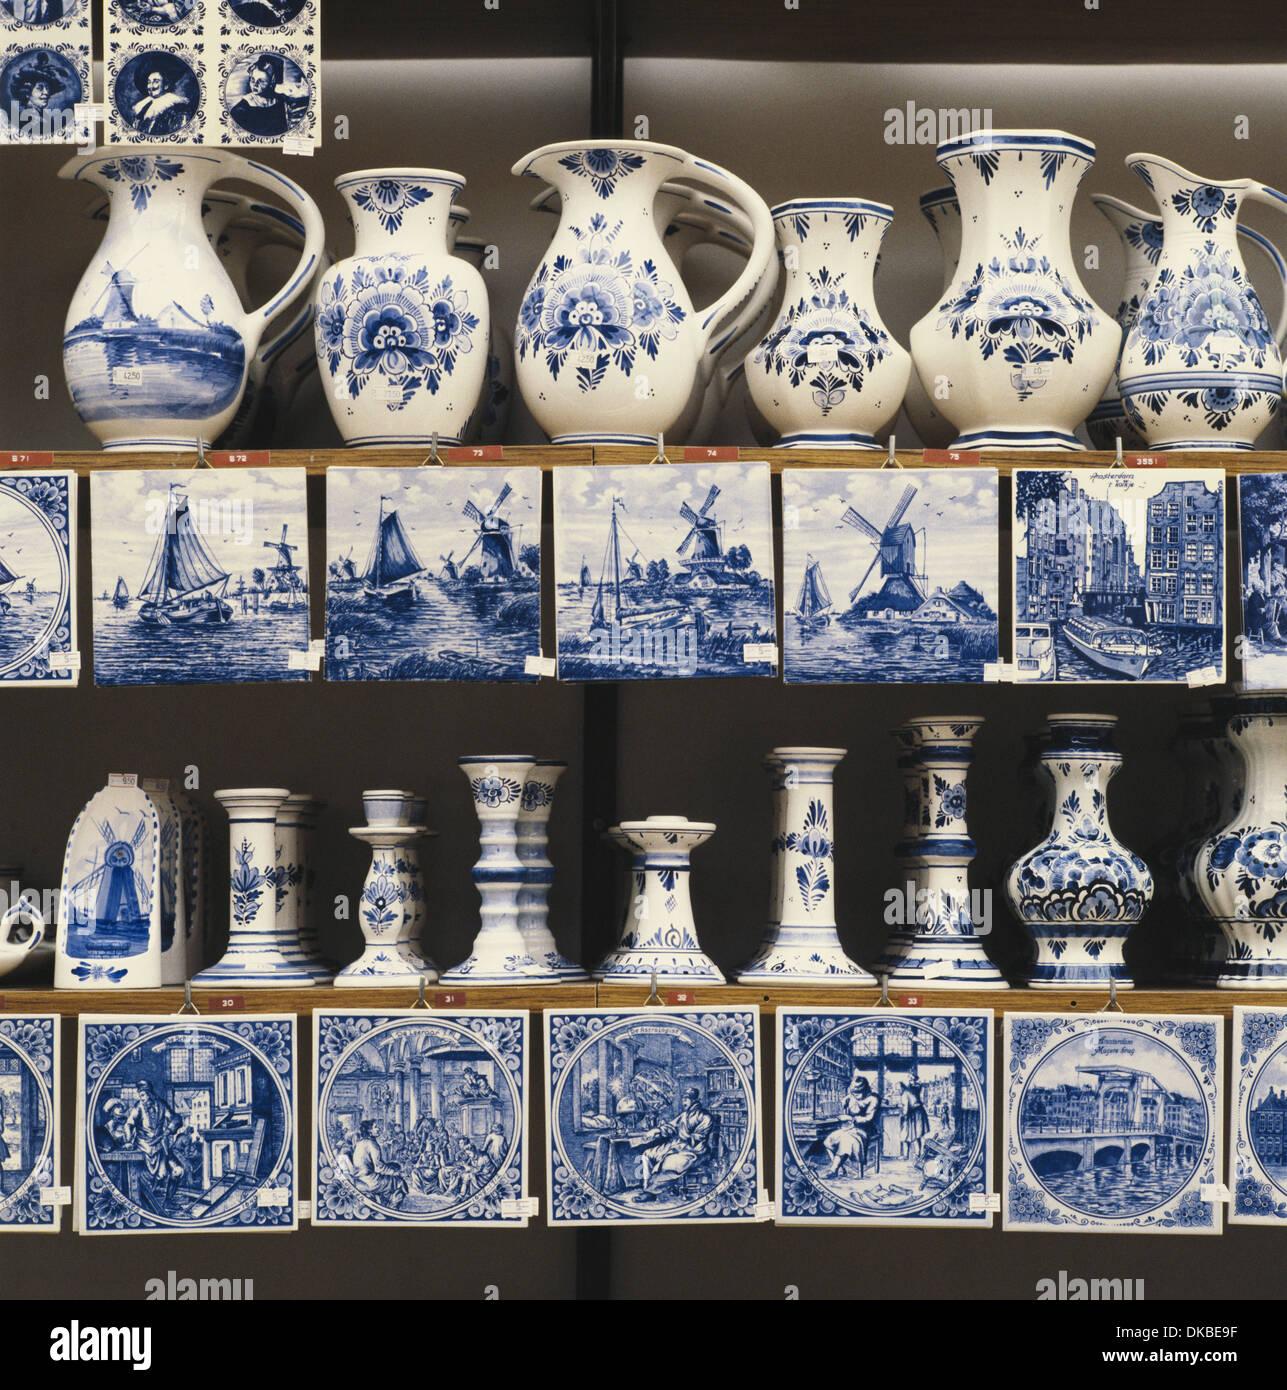 Delft Blue China Holland Amsterdam Netherlands Stock